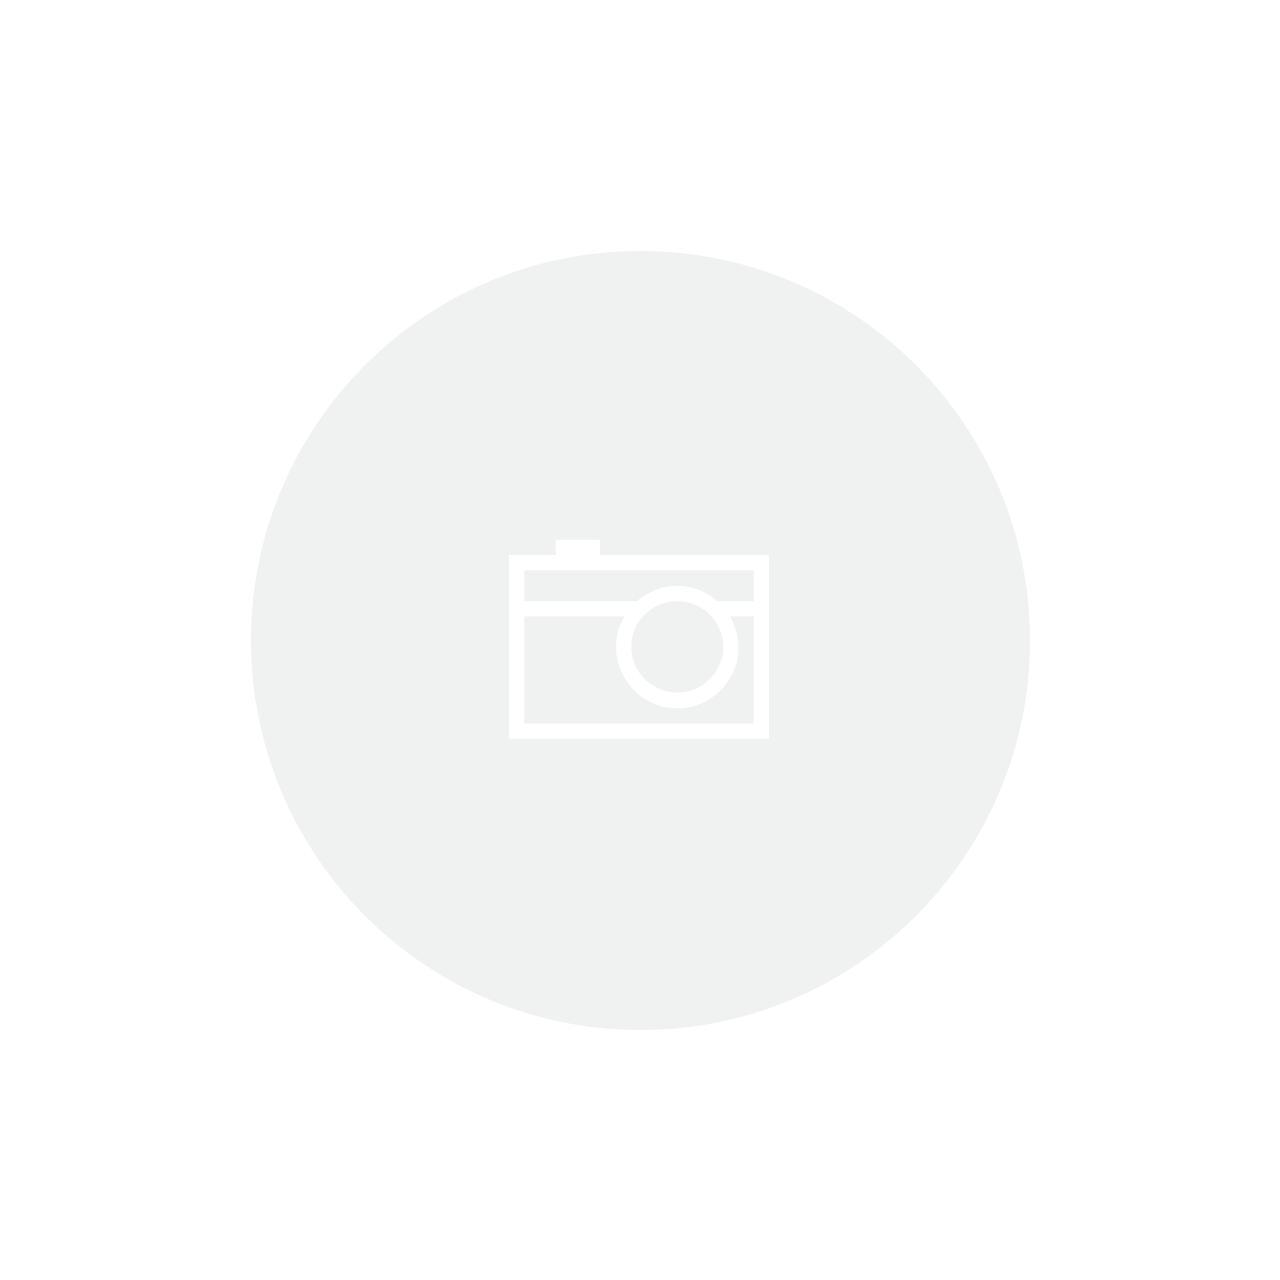 Apple Spice Vidro 15Ml Refil Essencia Antik